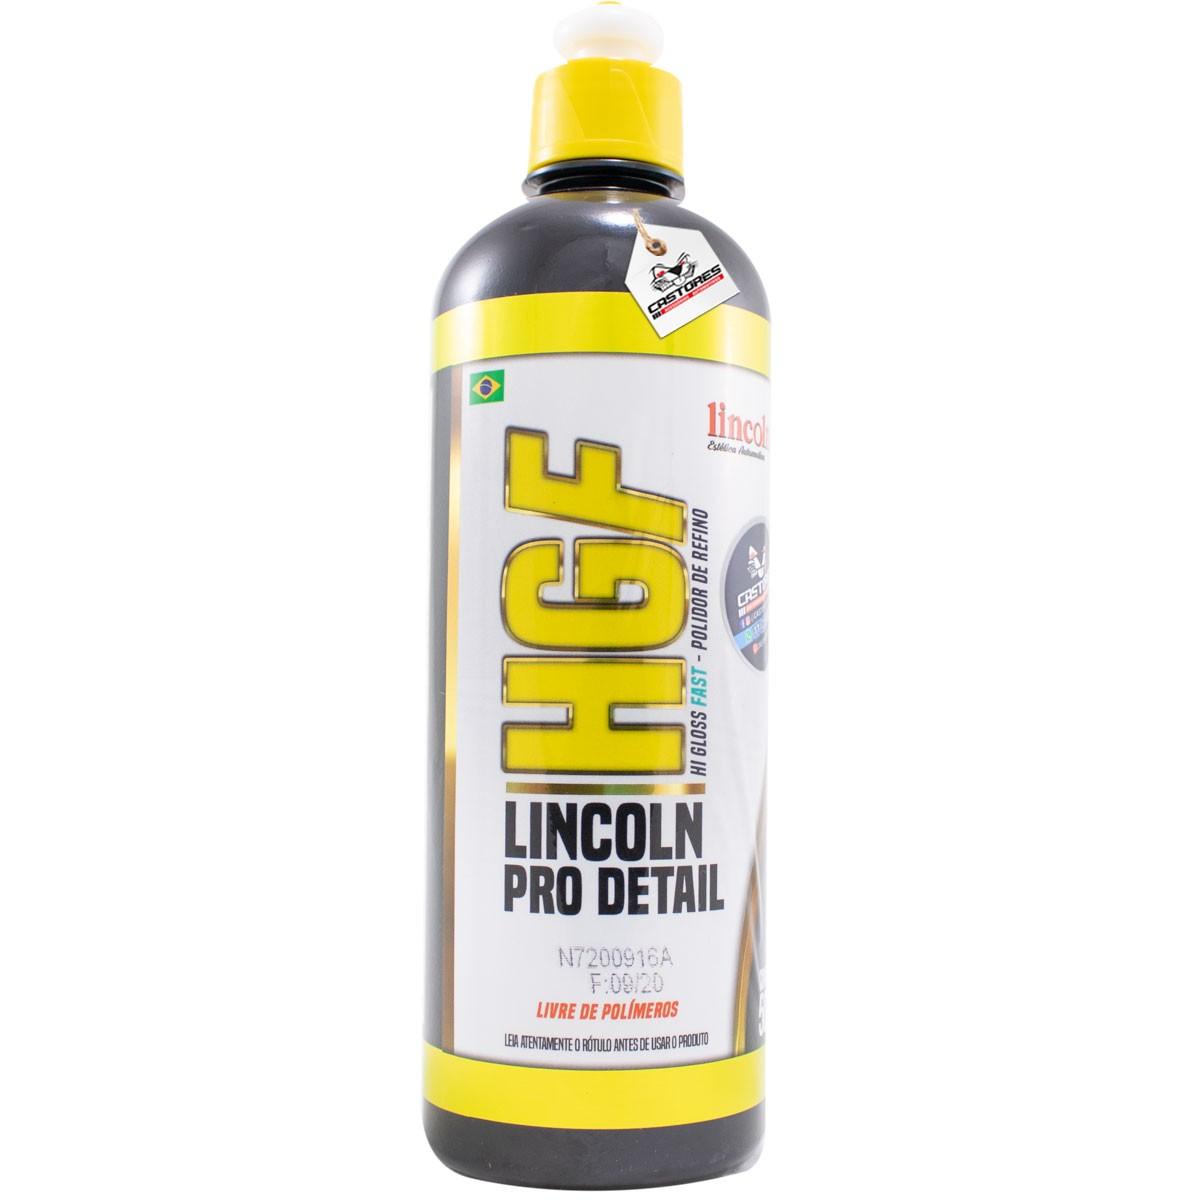 HGF HI GLOSS FAST 500G LINCOLN